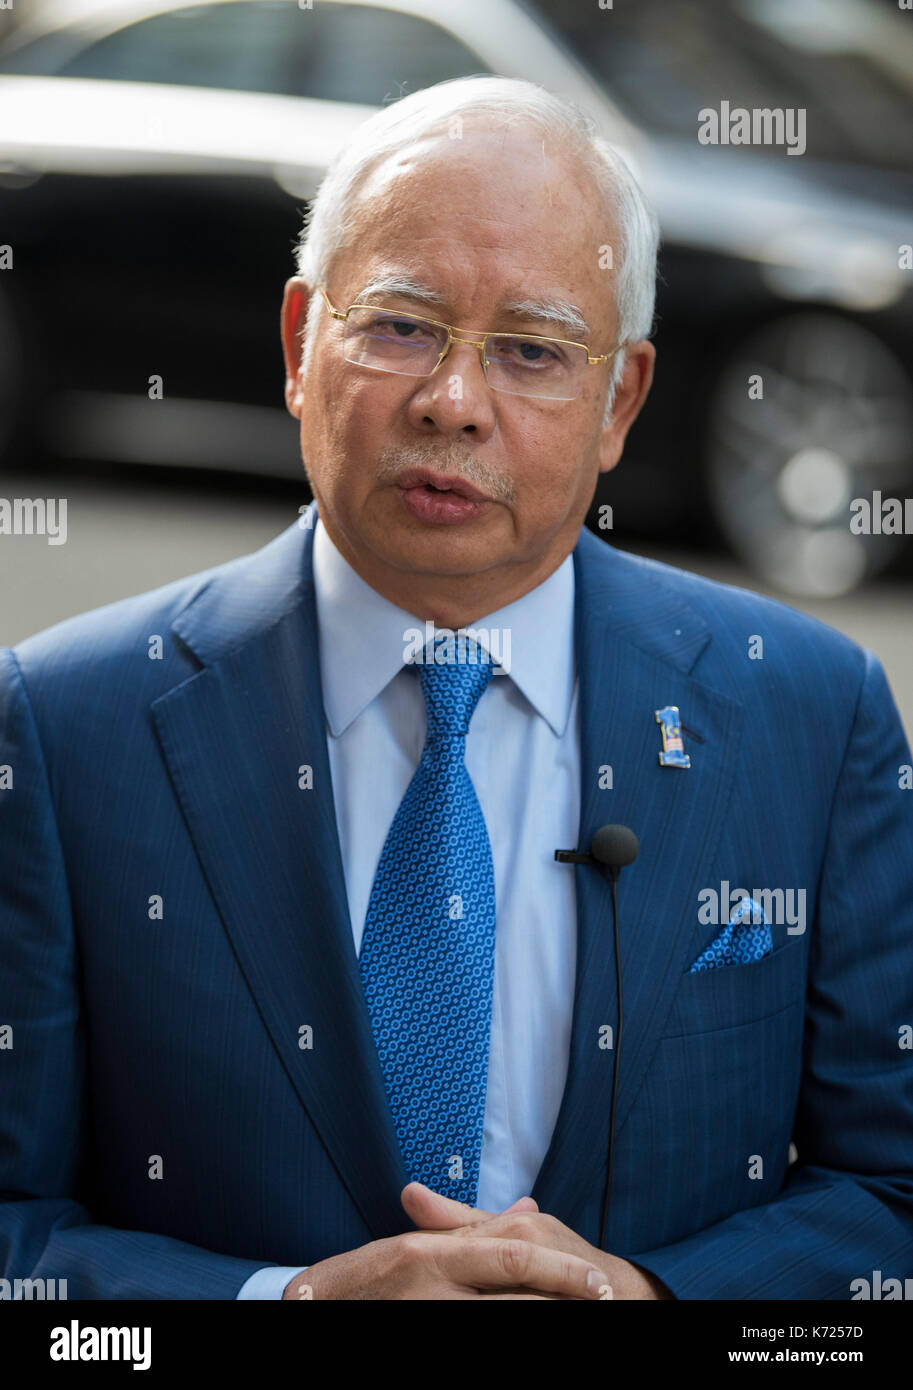 London, UK. 14th Sep, 2017. Prime Minister Najib Razak of Malaysia speaks to the press outside 10 Downing Street. - Stock Image